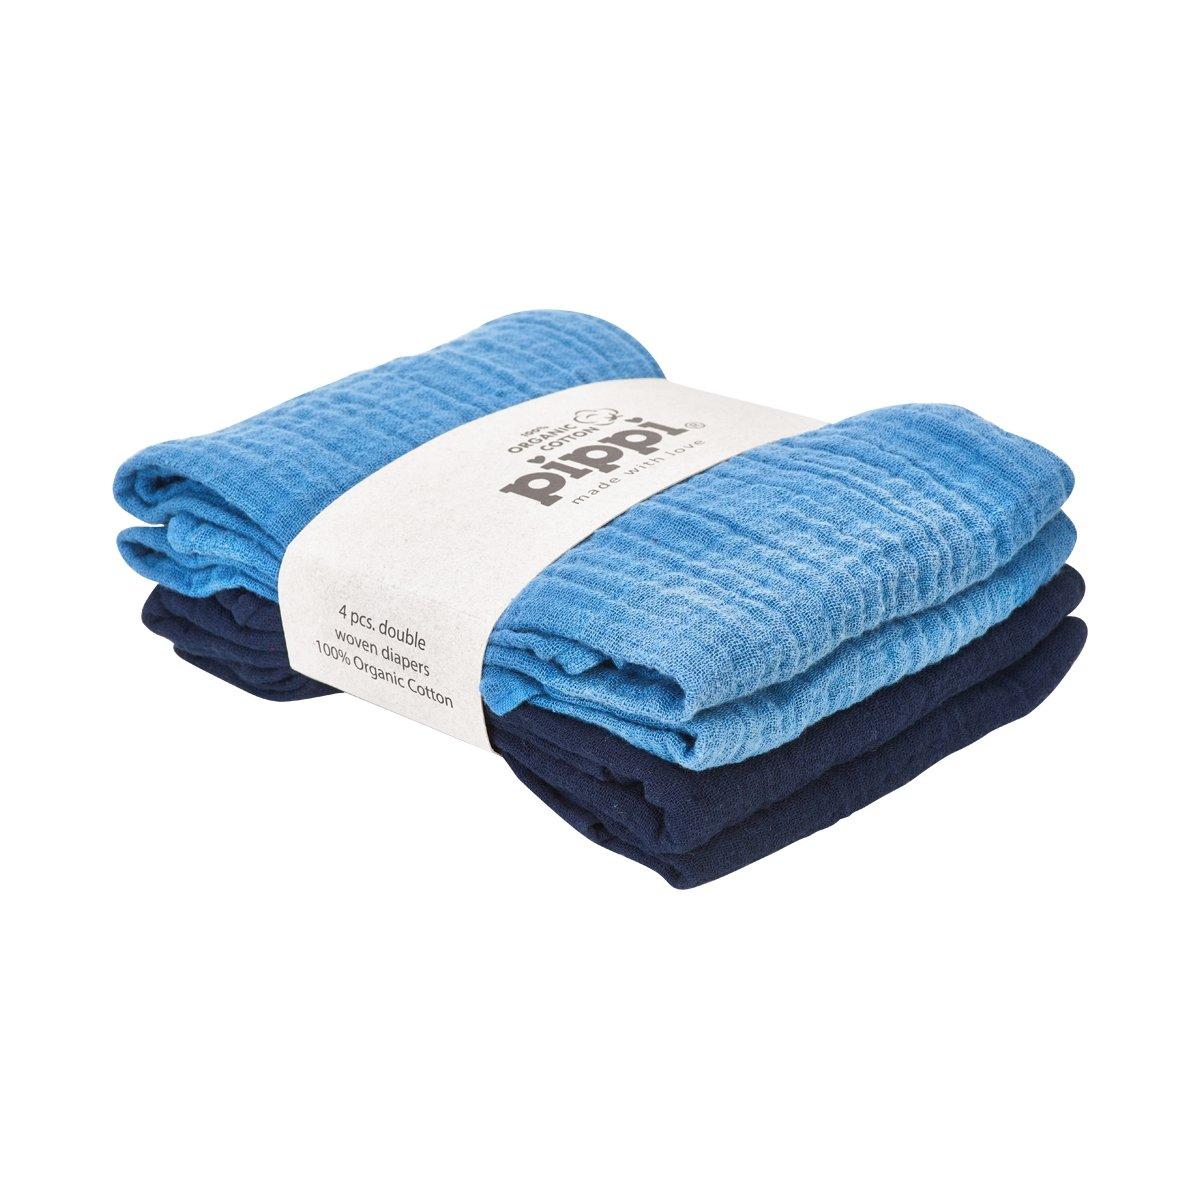 Pippi Stoffwindeln 4er Pack Mullwindeln Spuckt/ücher Organic Bio Baumwolle blau//dunkelblau